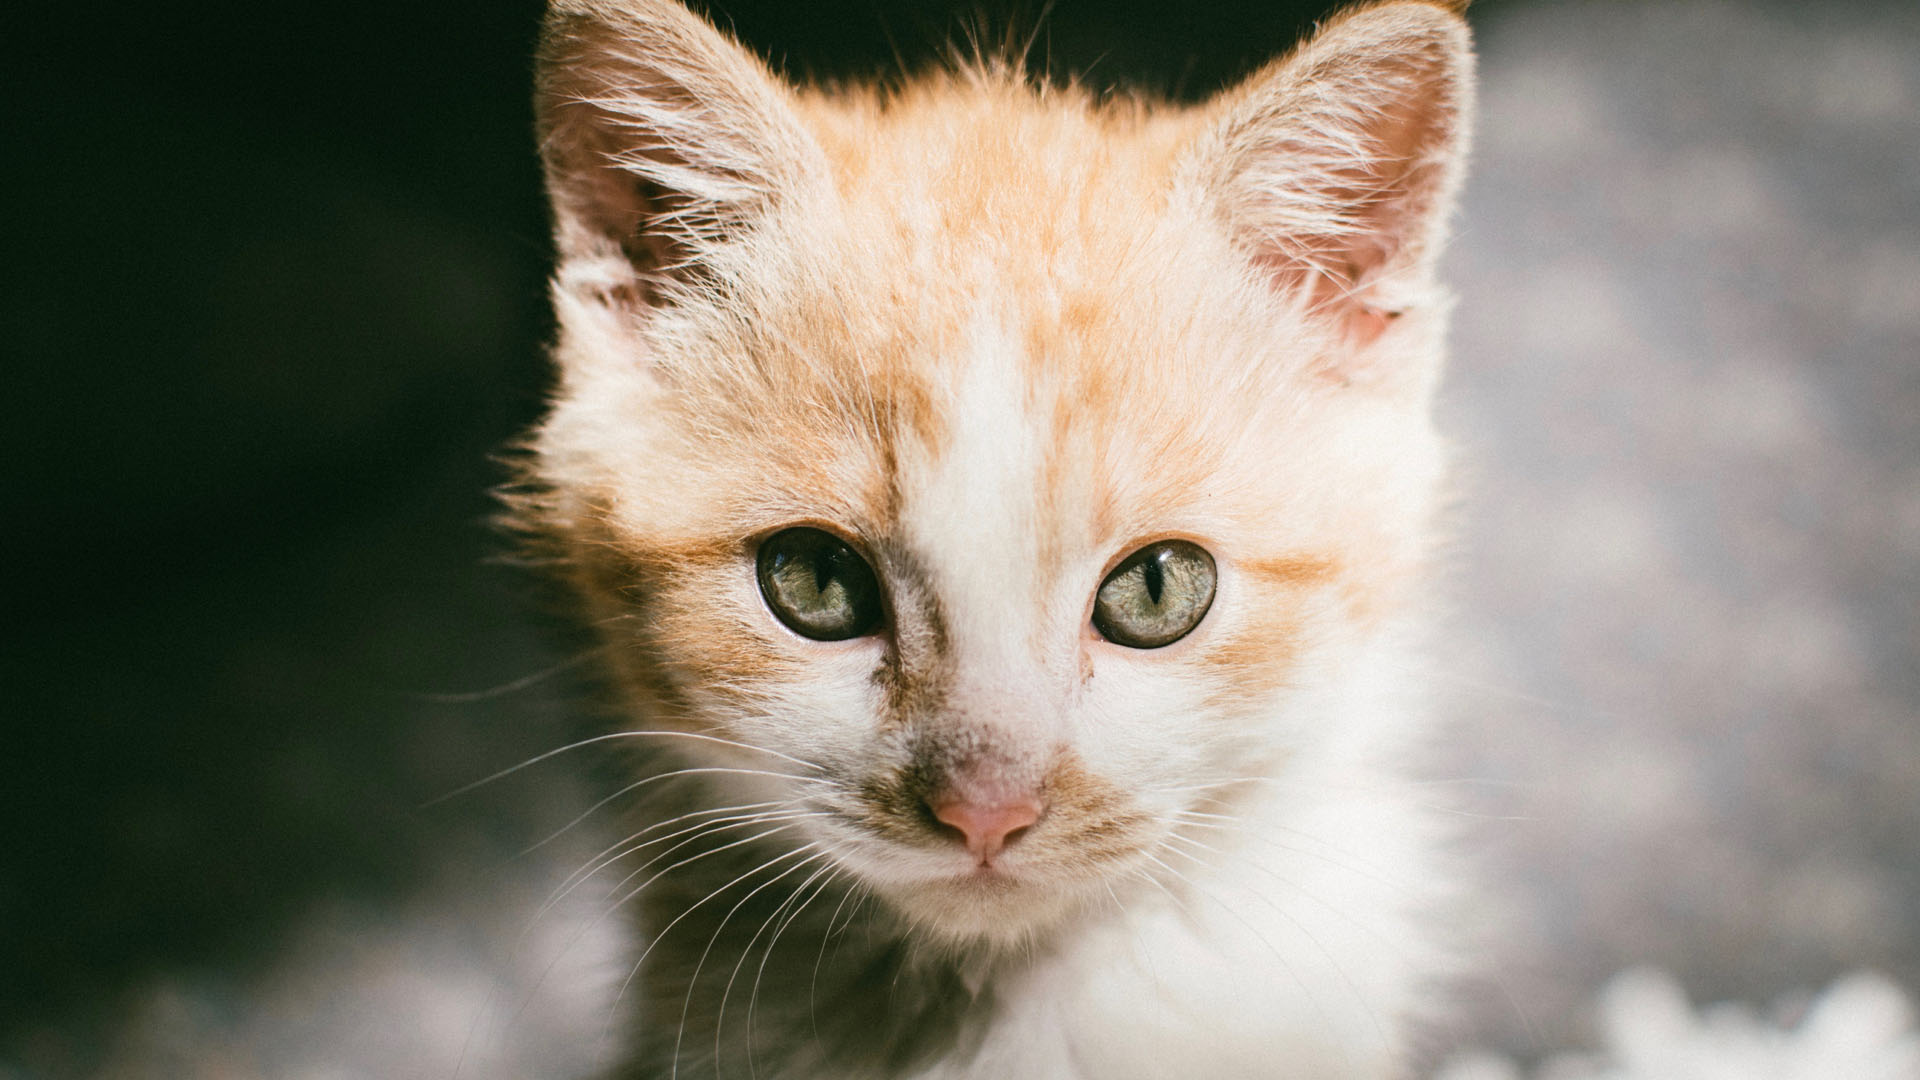 Beautiful Orange Kitten with Greenish Eyes Desktop Wallpaper 4K